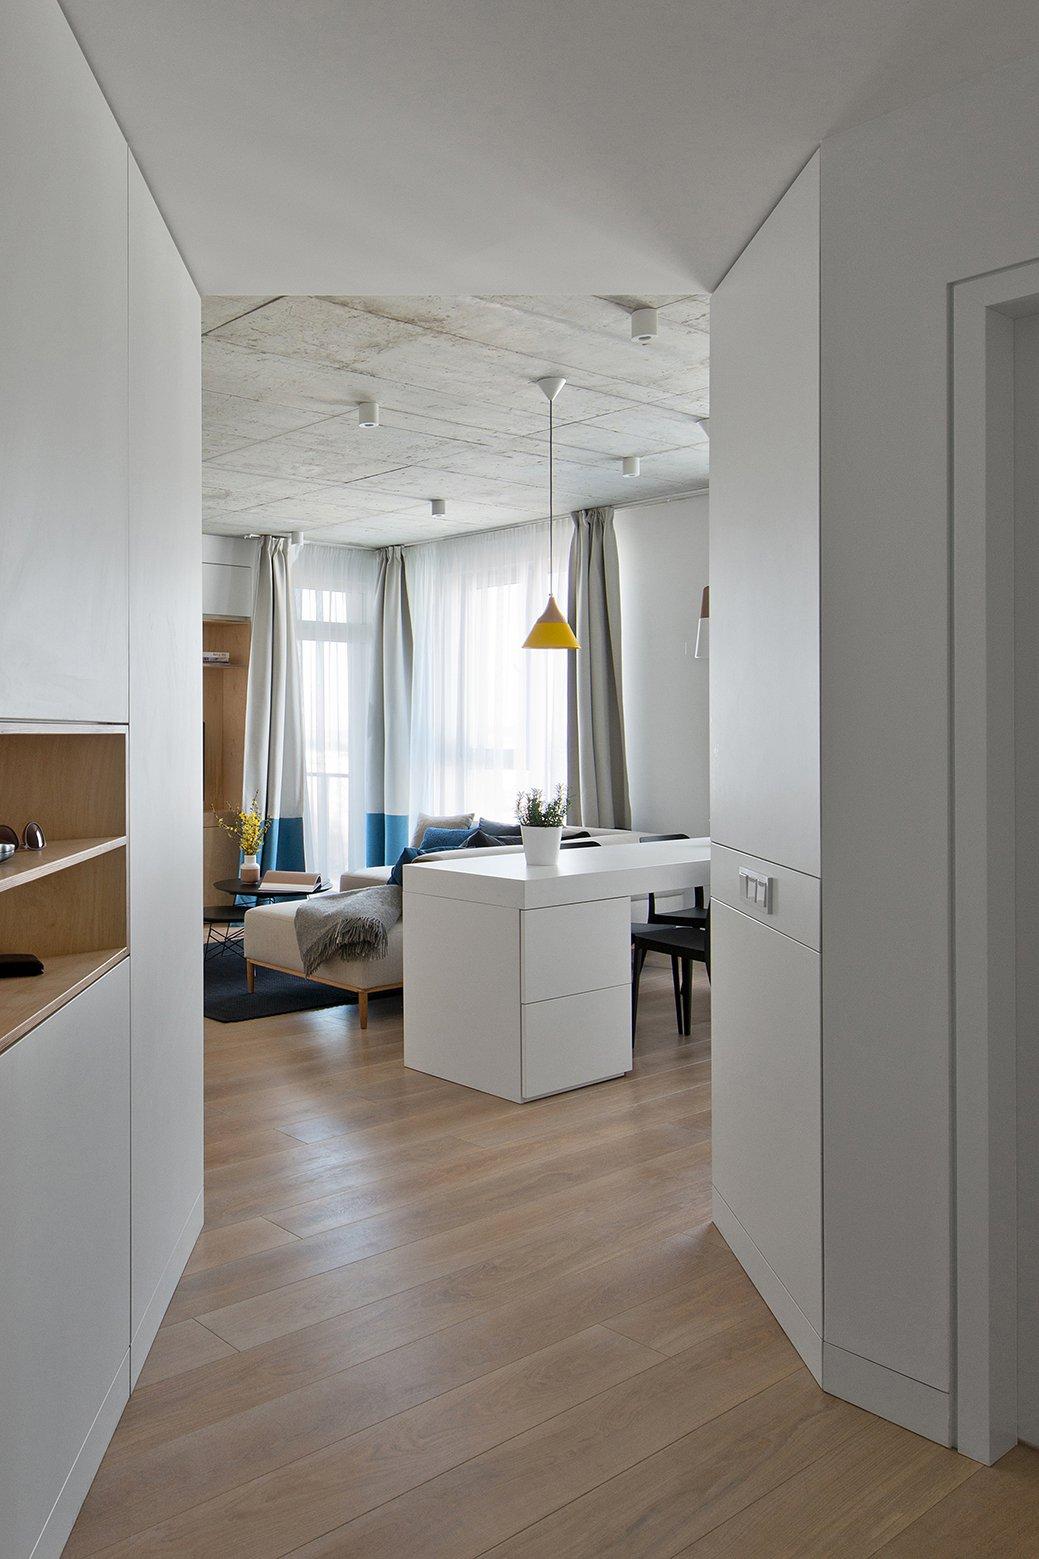 Apartment-in-Vilnius-Normundas-Vilkas-Lithuania-Entry-Humble-Homes